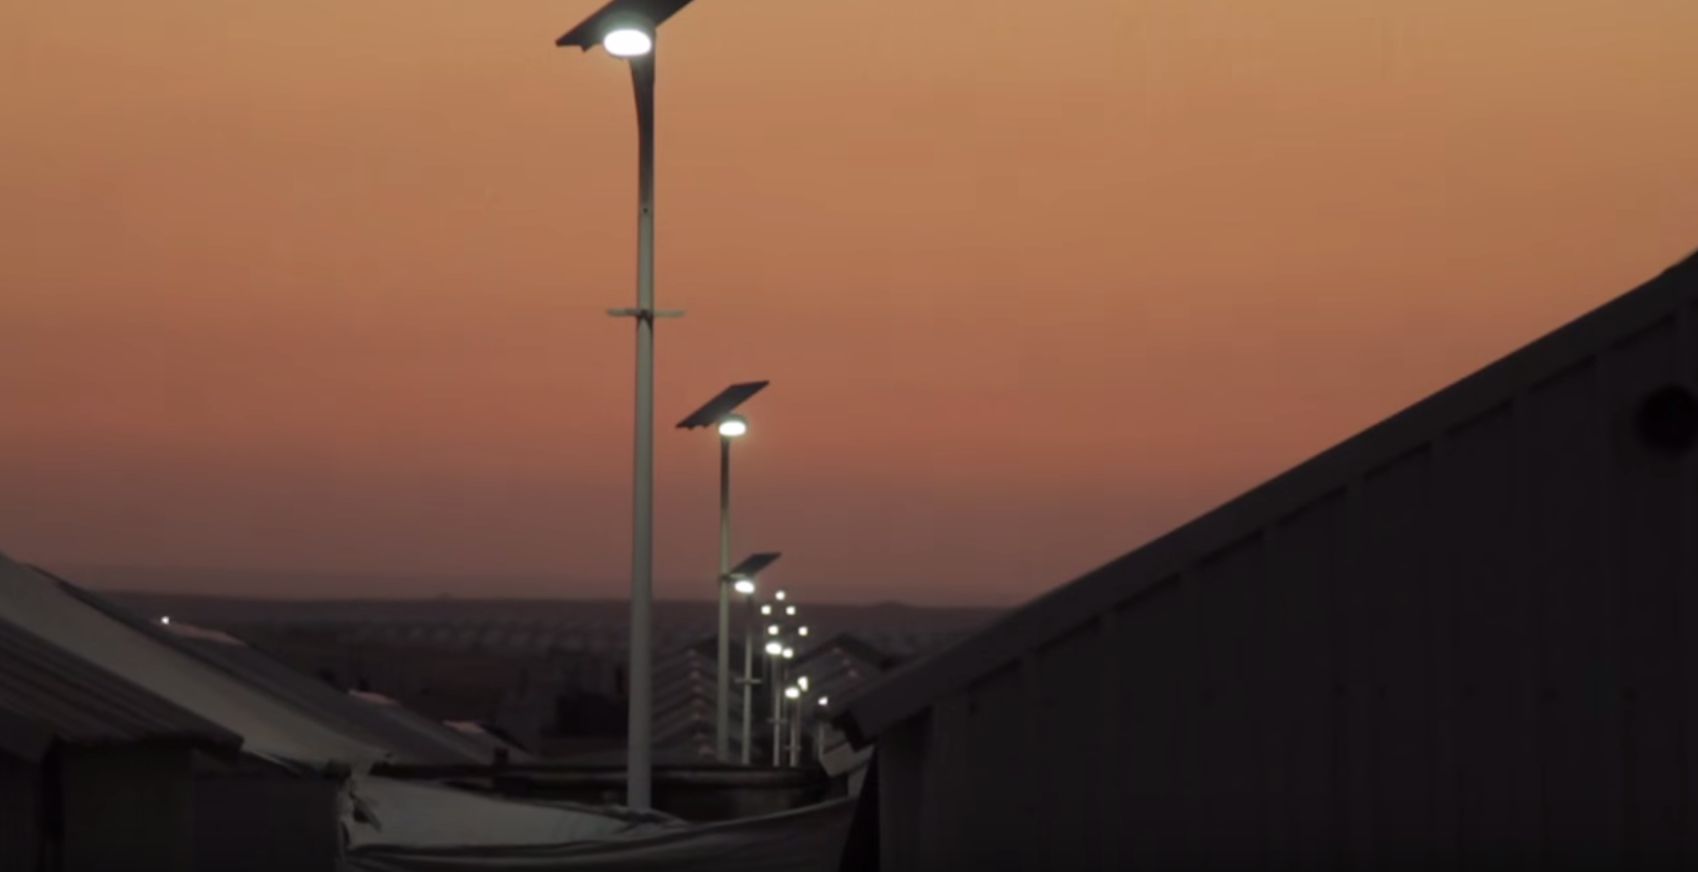 Historic First: Solar Plant Illuminates Syrian Refugee Camp, Vastly Improving Quality of Life